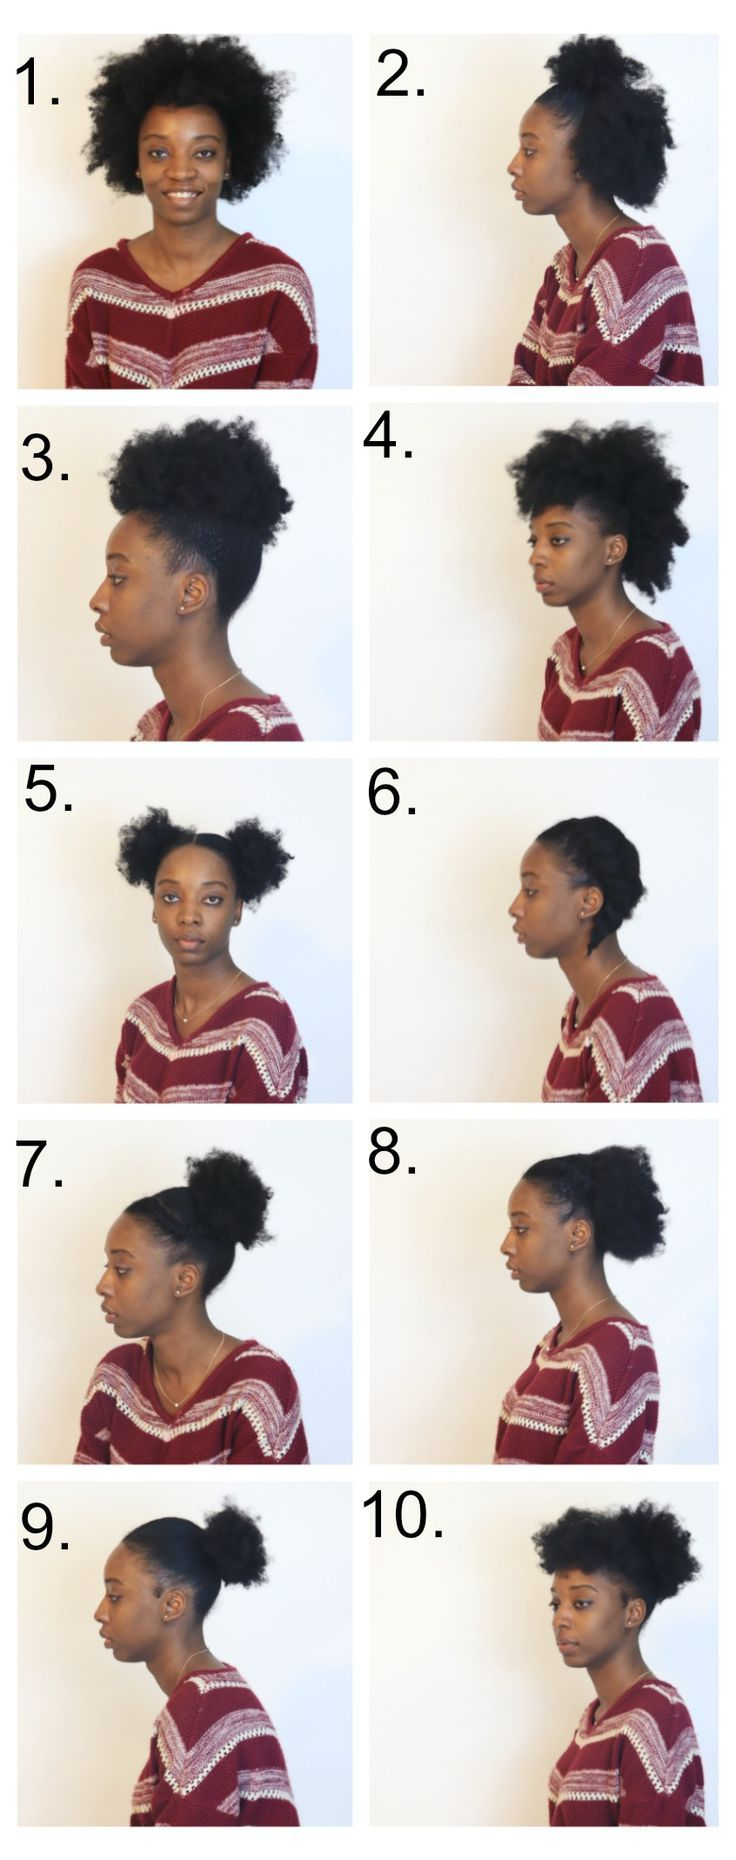 10 easy ways to style short natural hair | natural hair